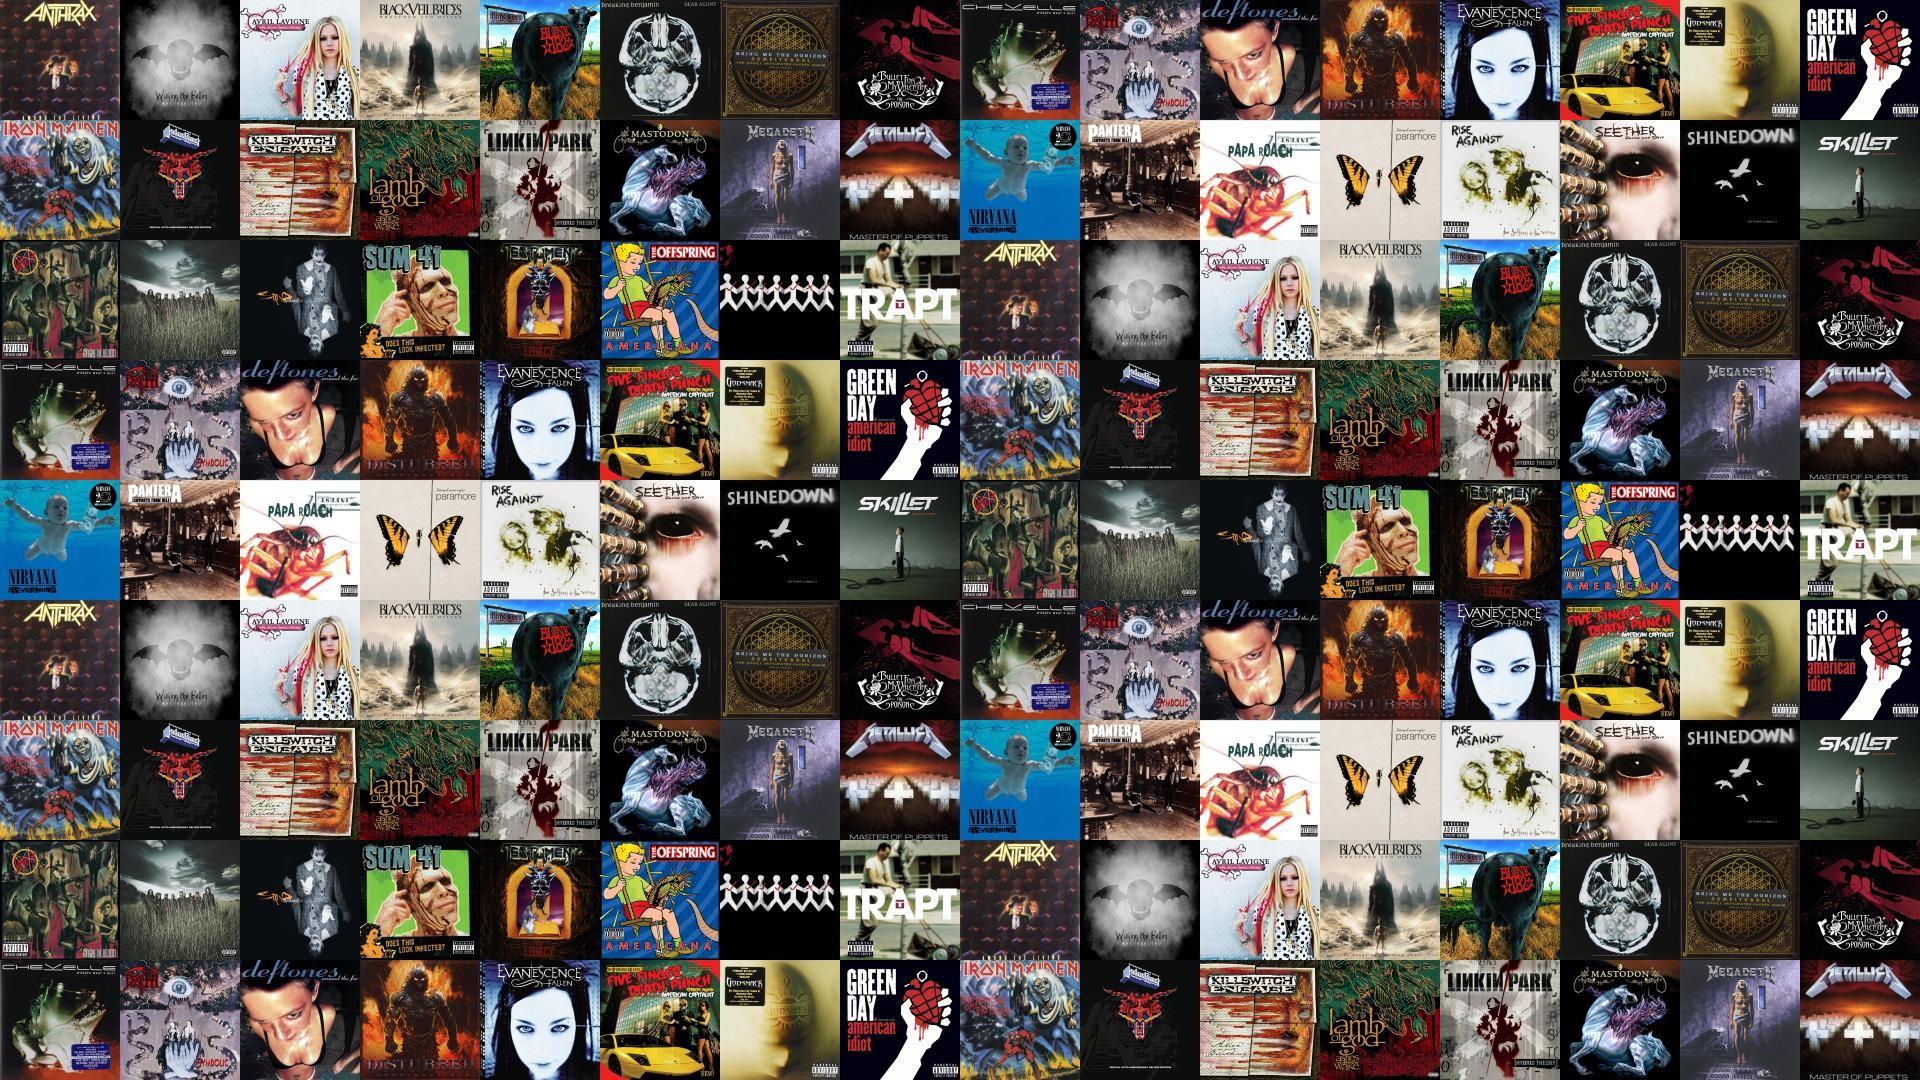 Anthrax Among The Living Avenged Sevenfold Waking Fallen Wallpaper